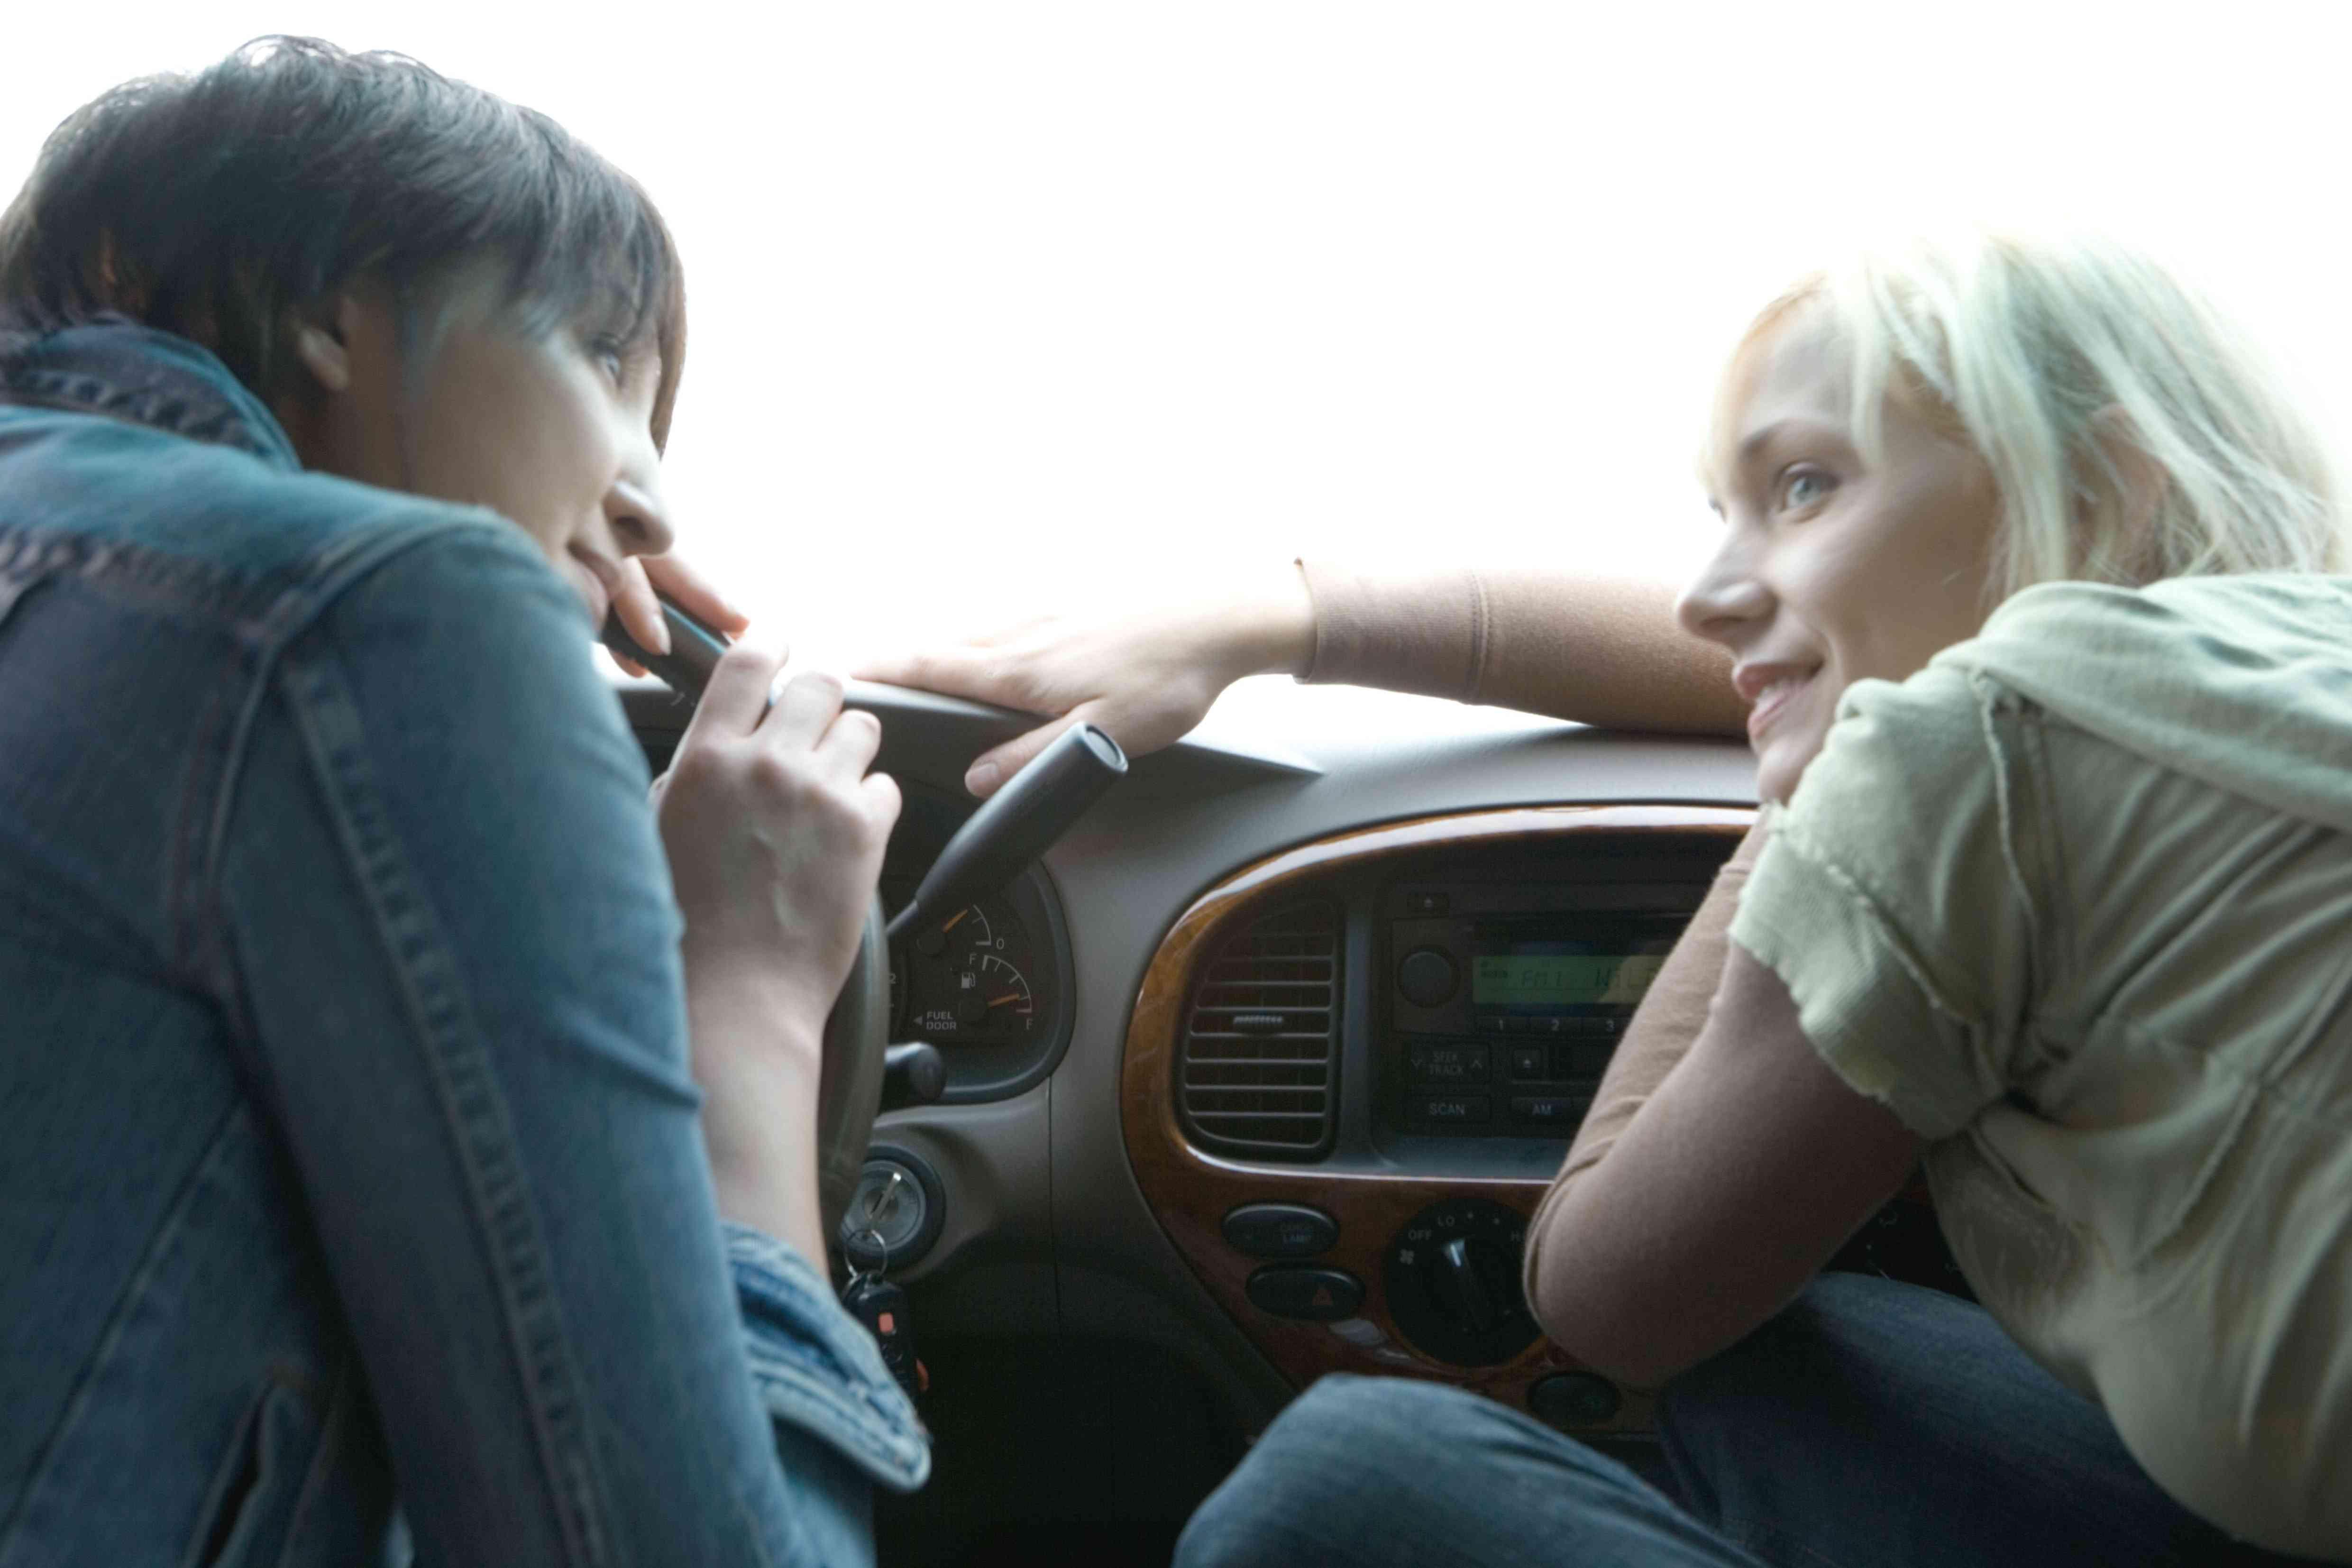 Reasons Your Car Radio Reception Sucks